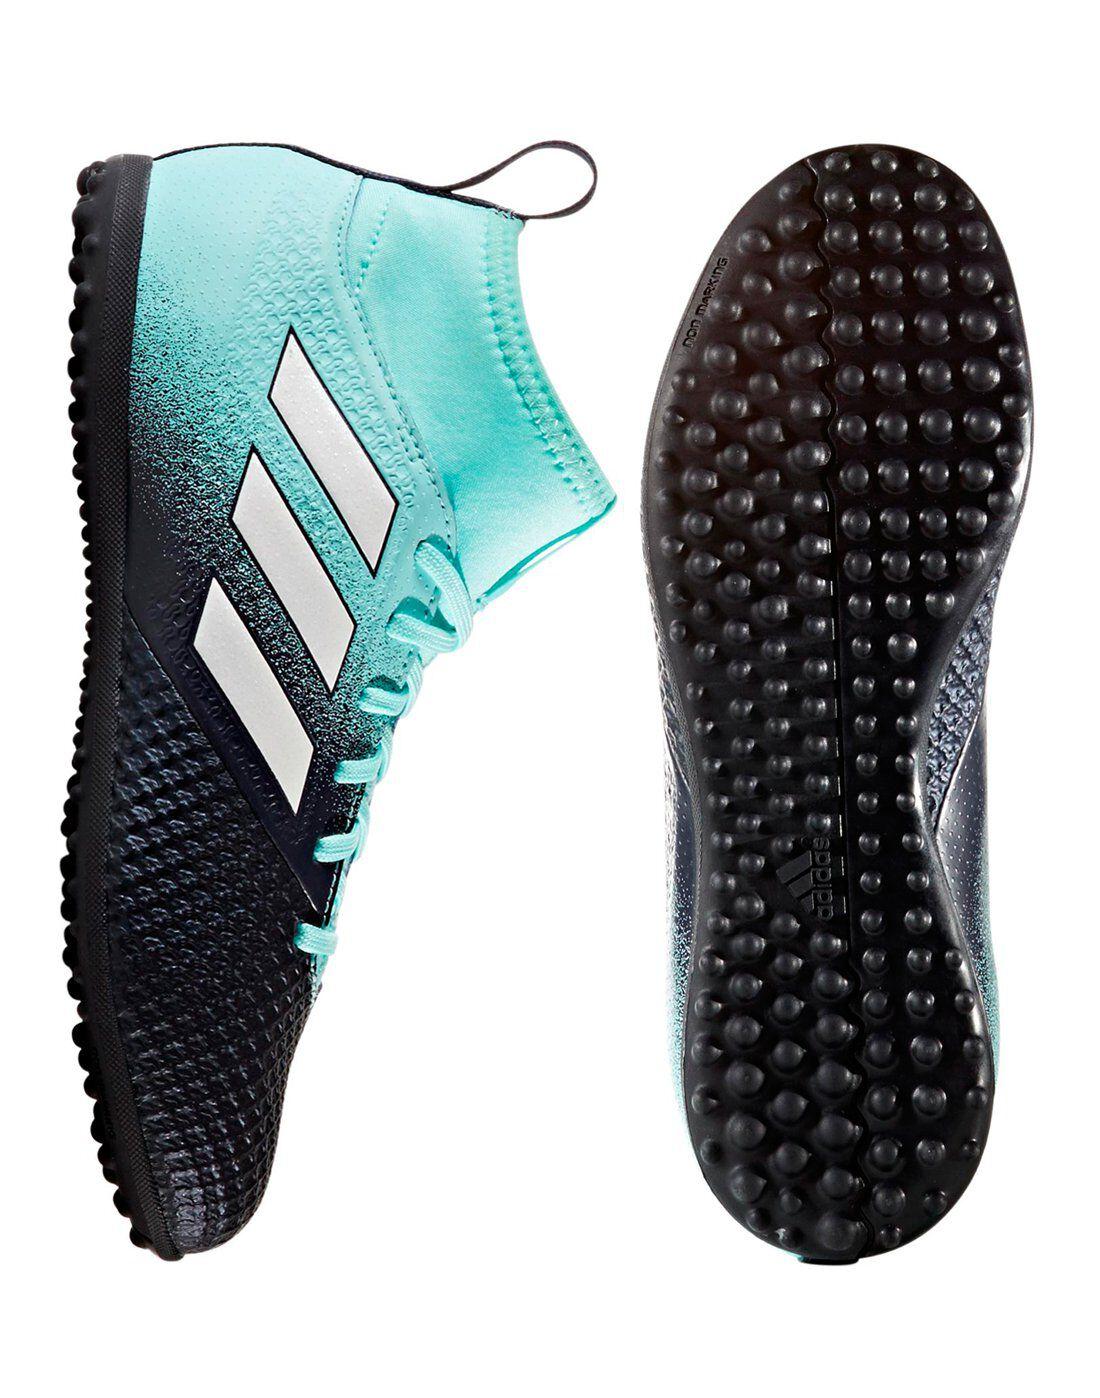 Kids adidas Ace 17.3 Astro Turf Ocean